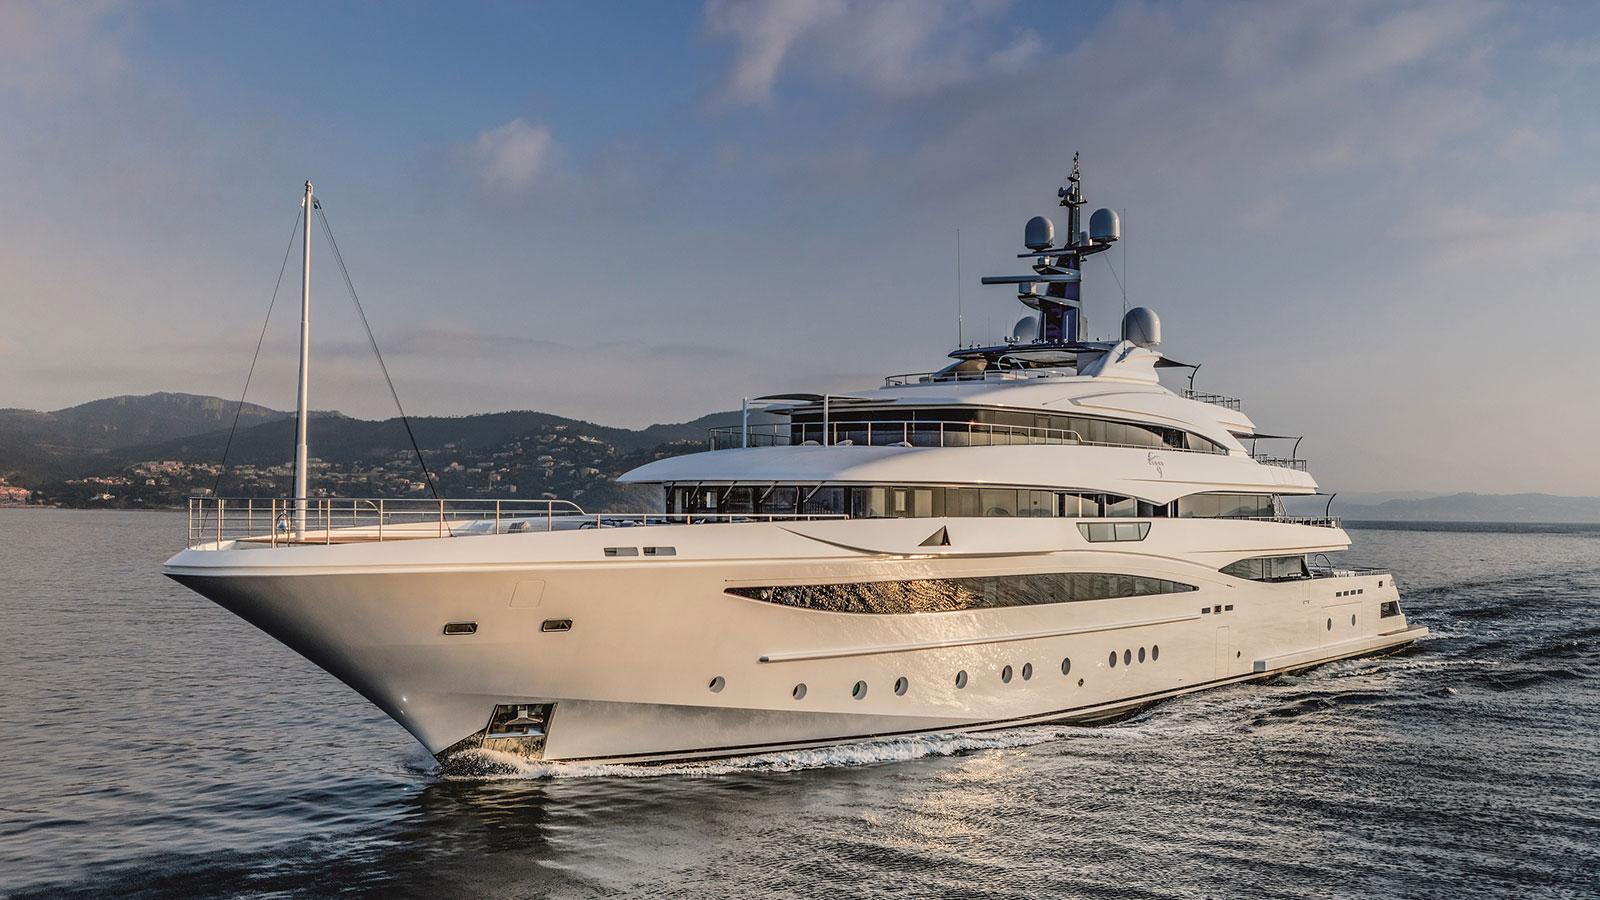 74 Metre Crn Motor Yacht Cloud 9 Sold